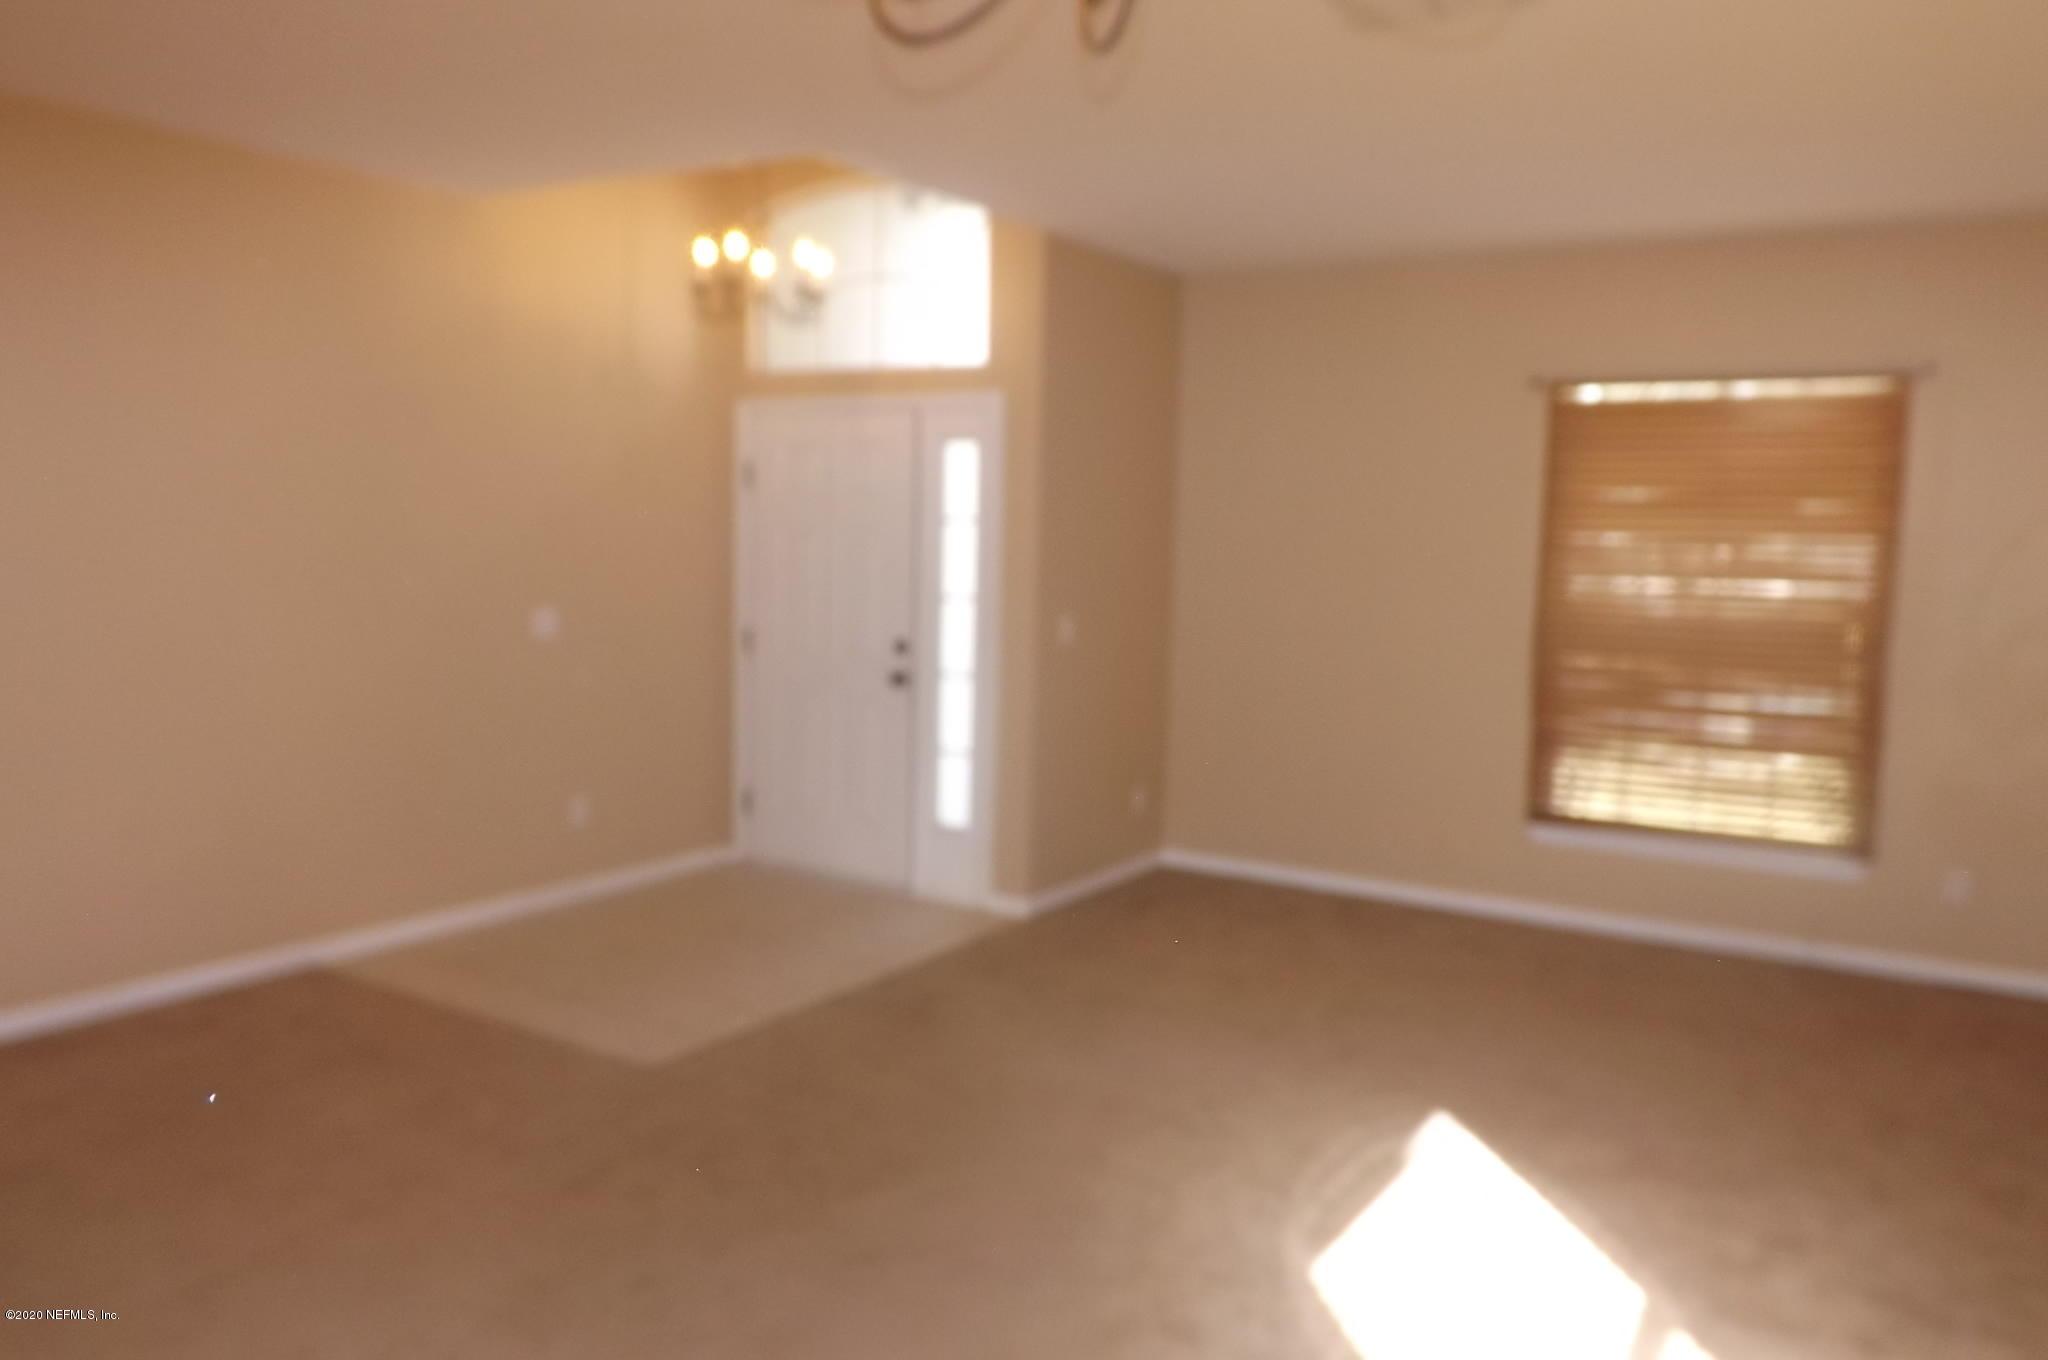 620 LONGCREST, ORANGE PARK, FLORIDA 32065, 4 Bedrooms Bedrooms, ,2 BathroomsBathrooms,Residential,For sale,LONGCREST,1033971